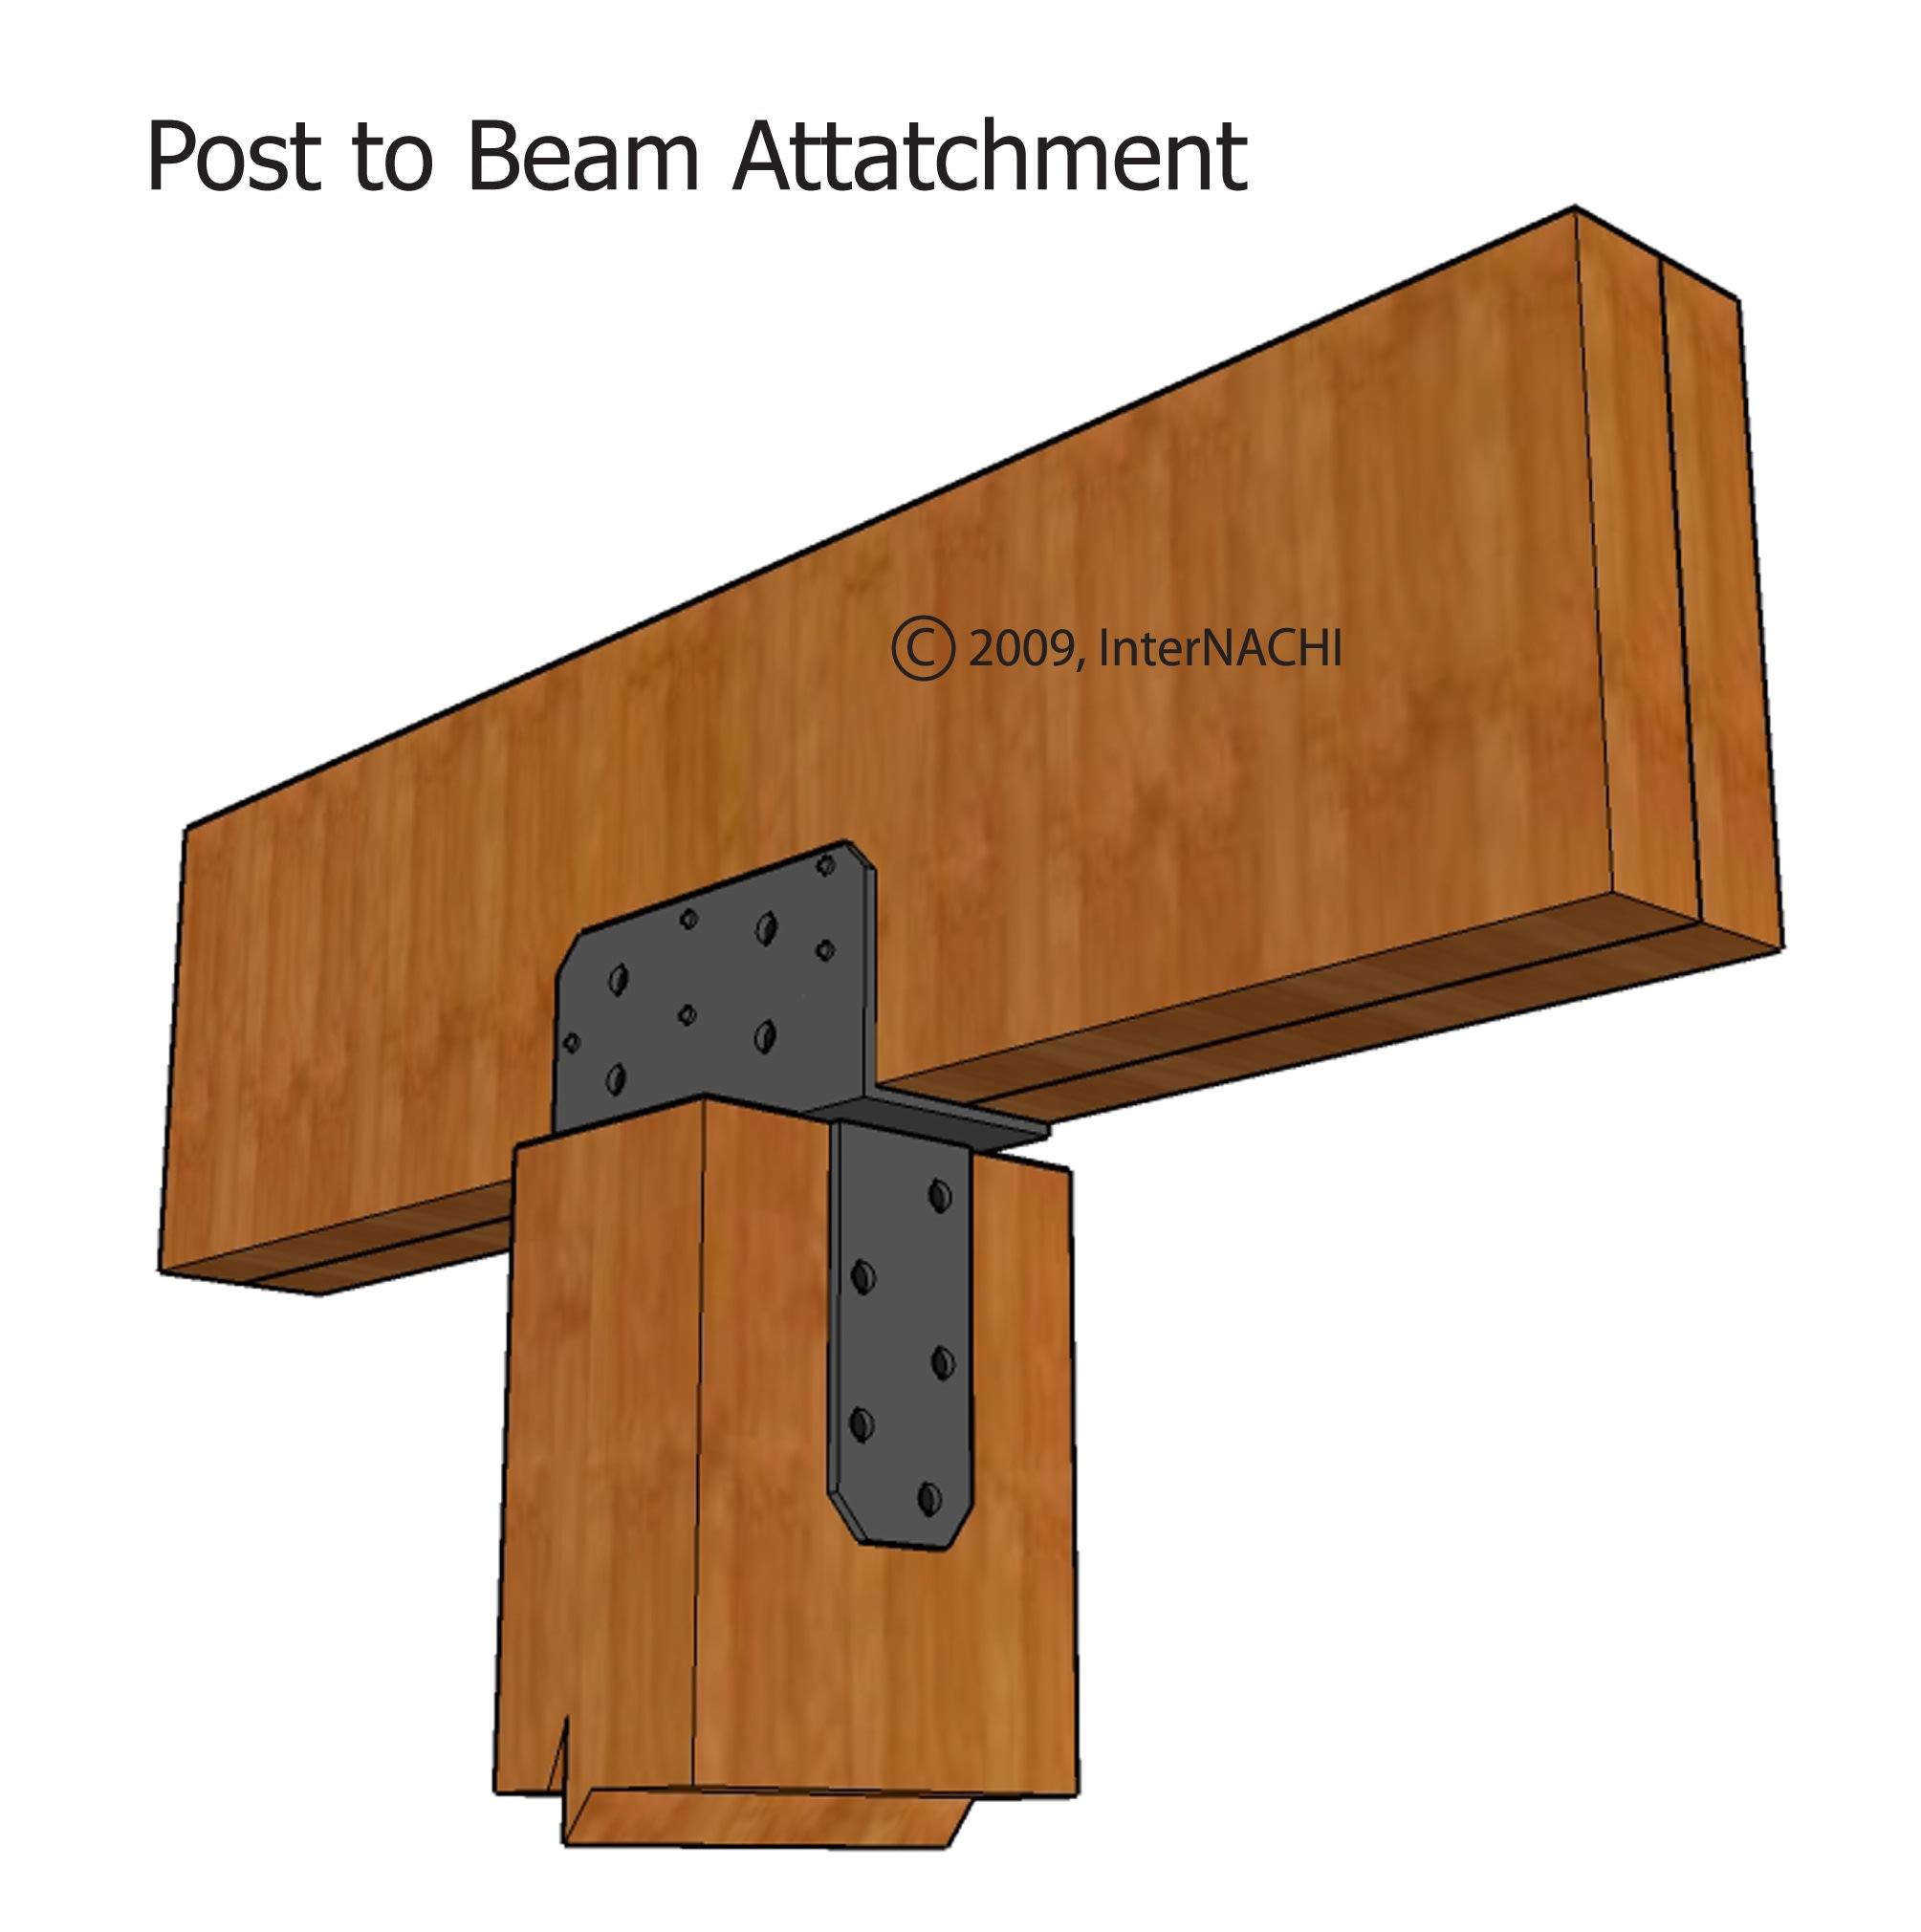 Post to beam attachment.